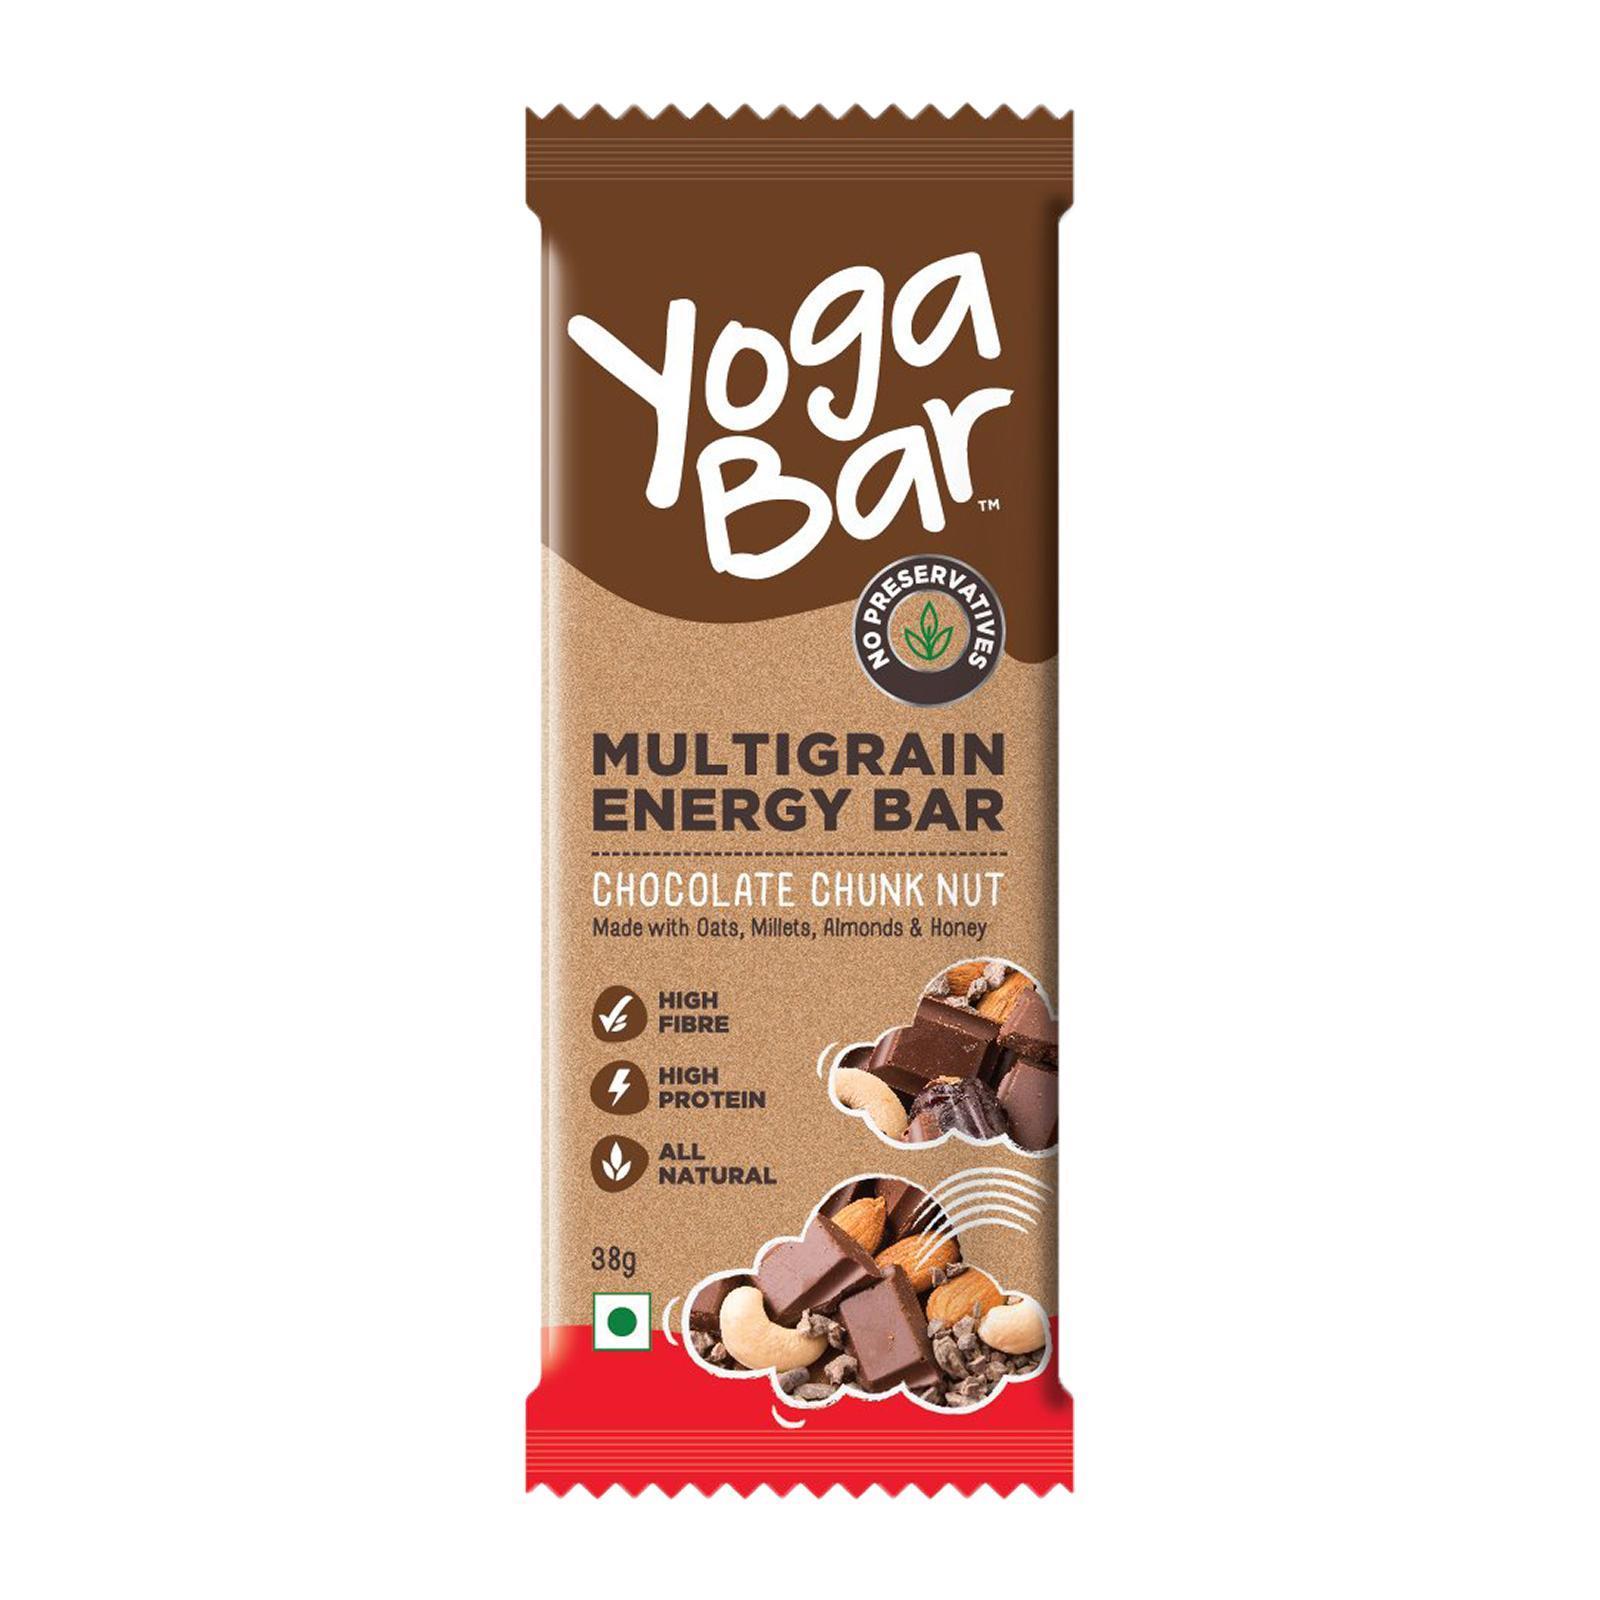 Yoga Bar Multigrain Energy Bar Chocolate Chunk Nut - By Sonnamera